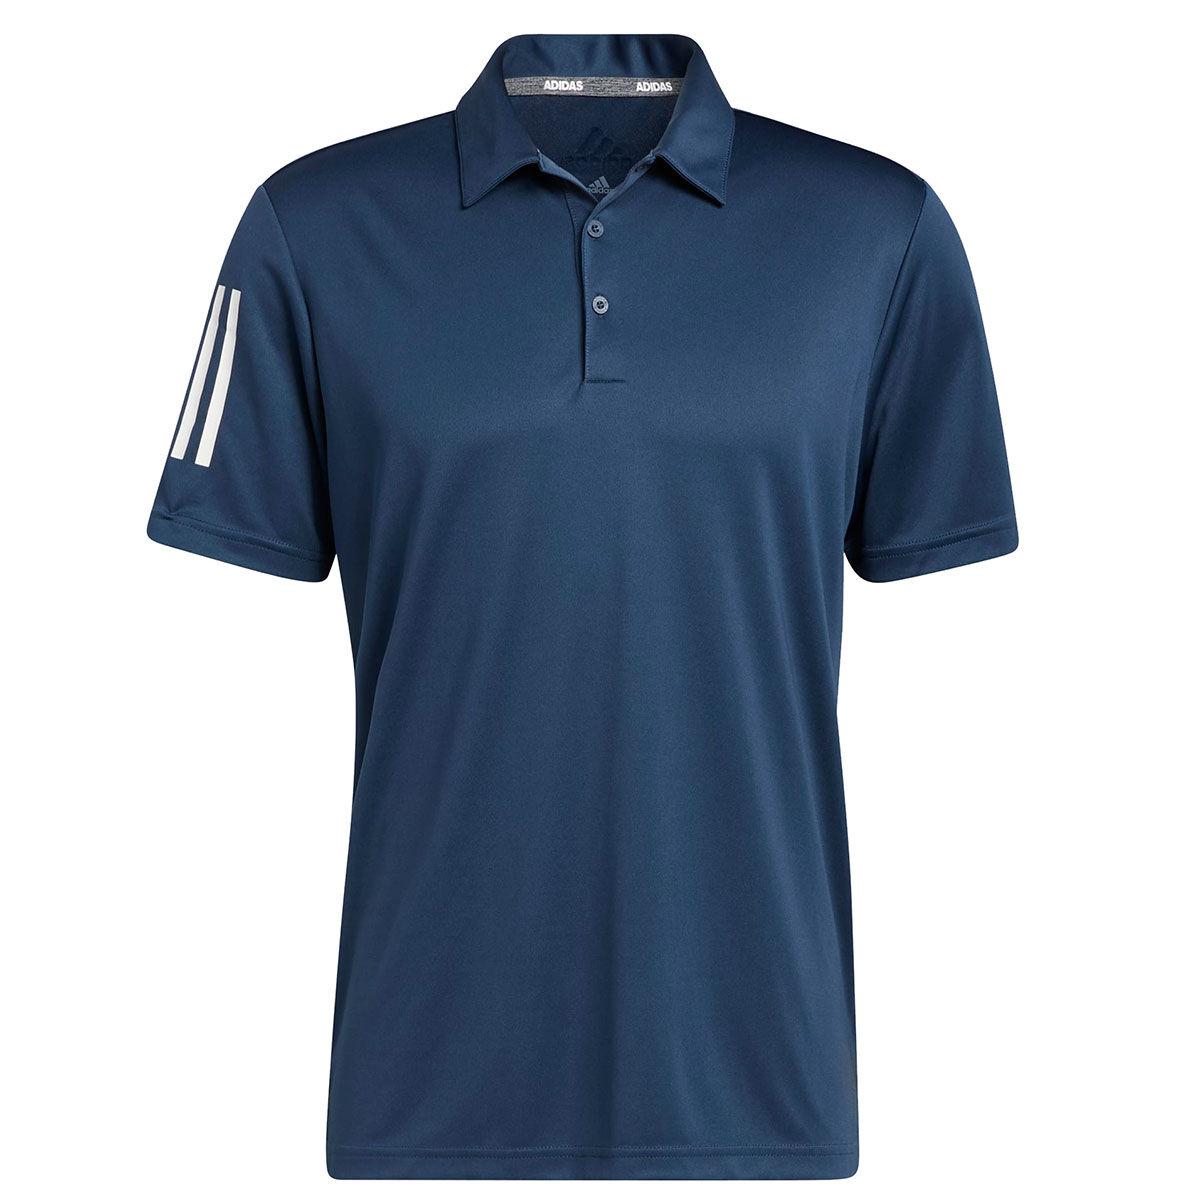 adidas Golf 3-Stripe Basic Golf Polo Shirt, Mens, Crew navy, Large | American Golf